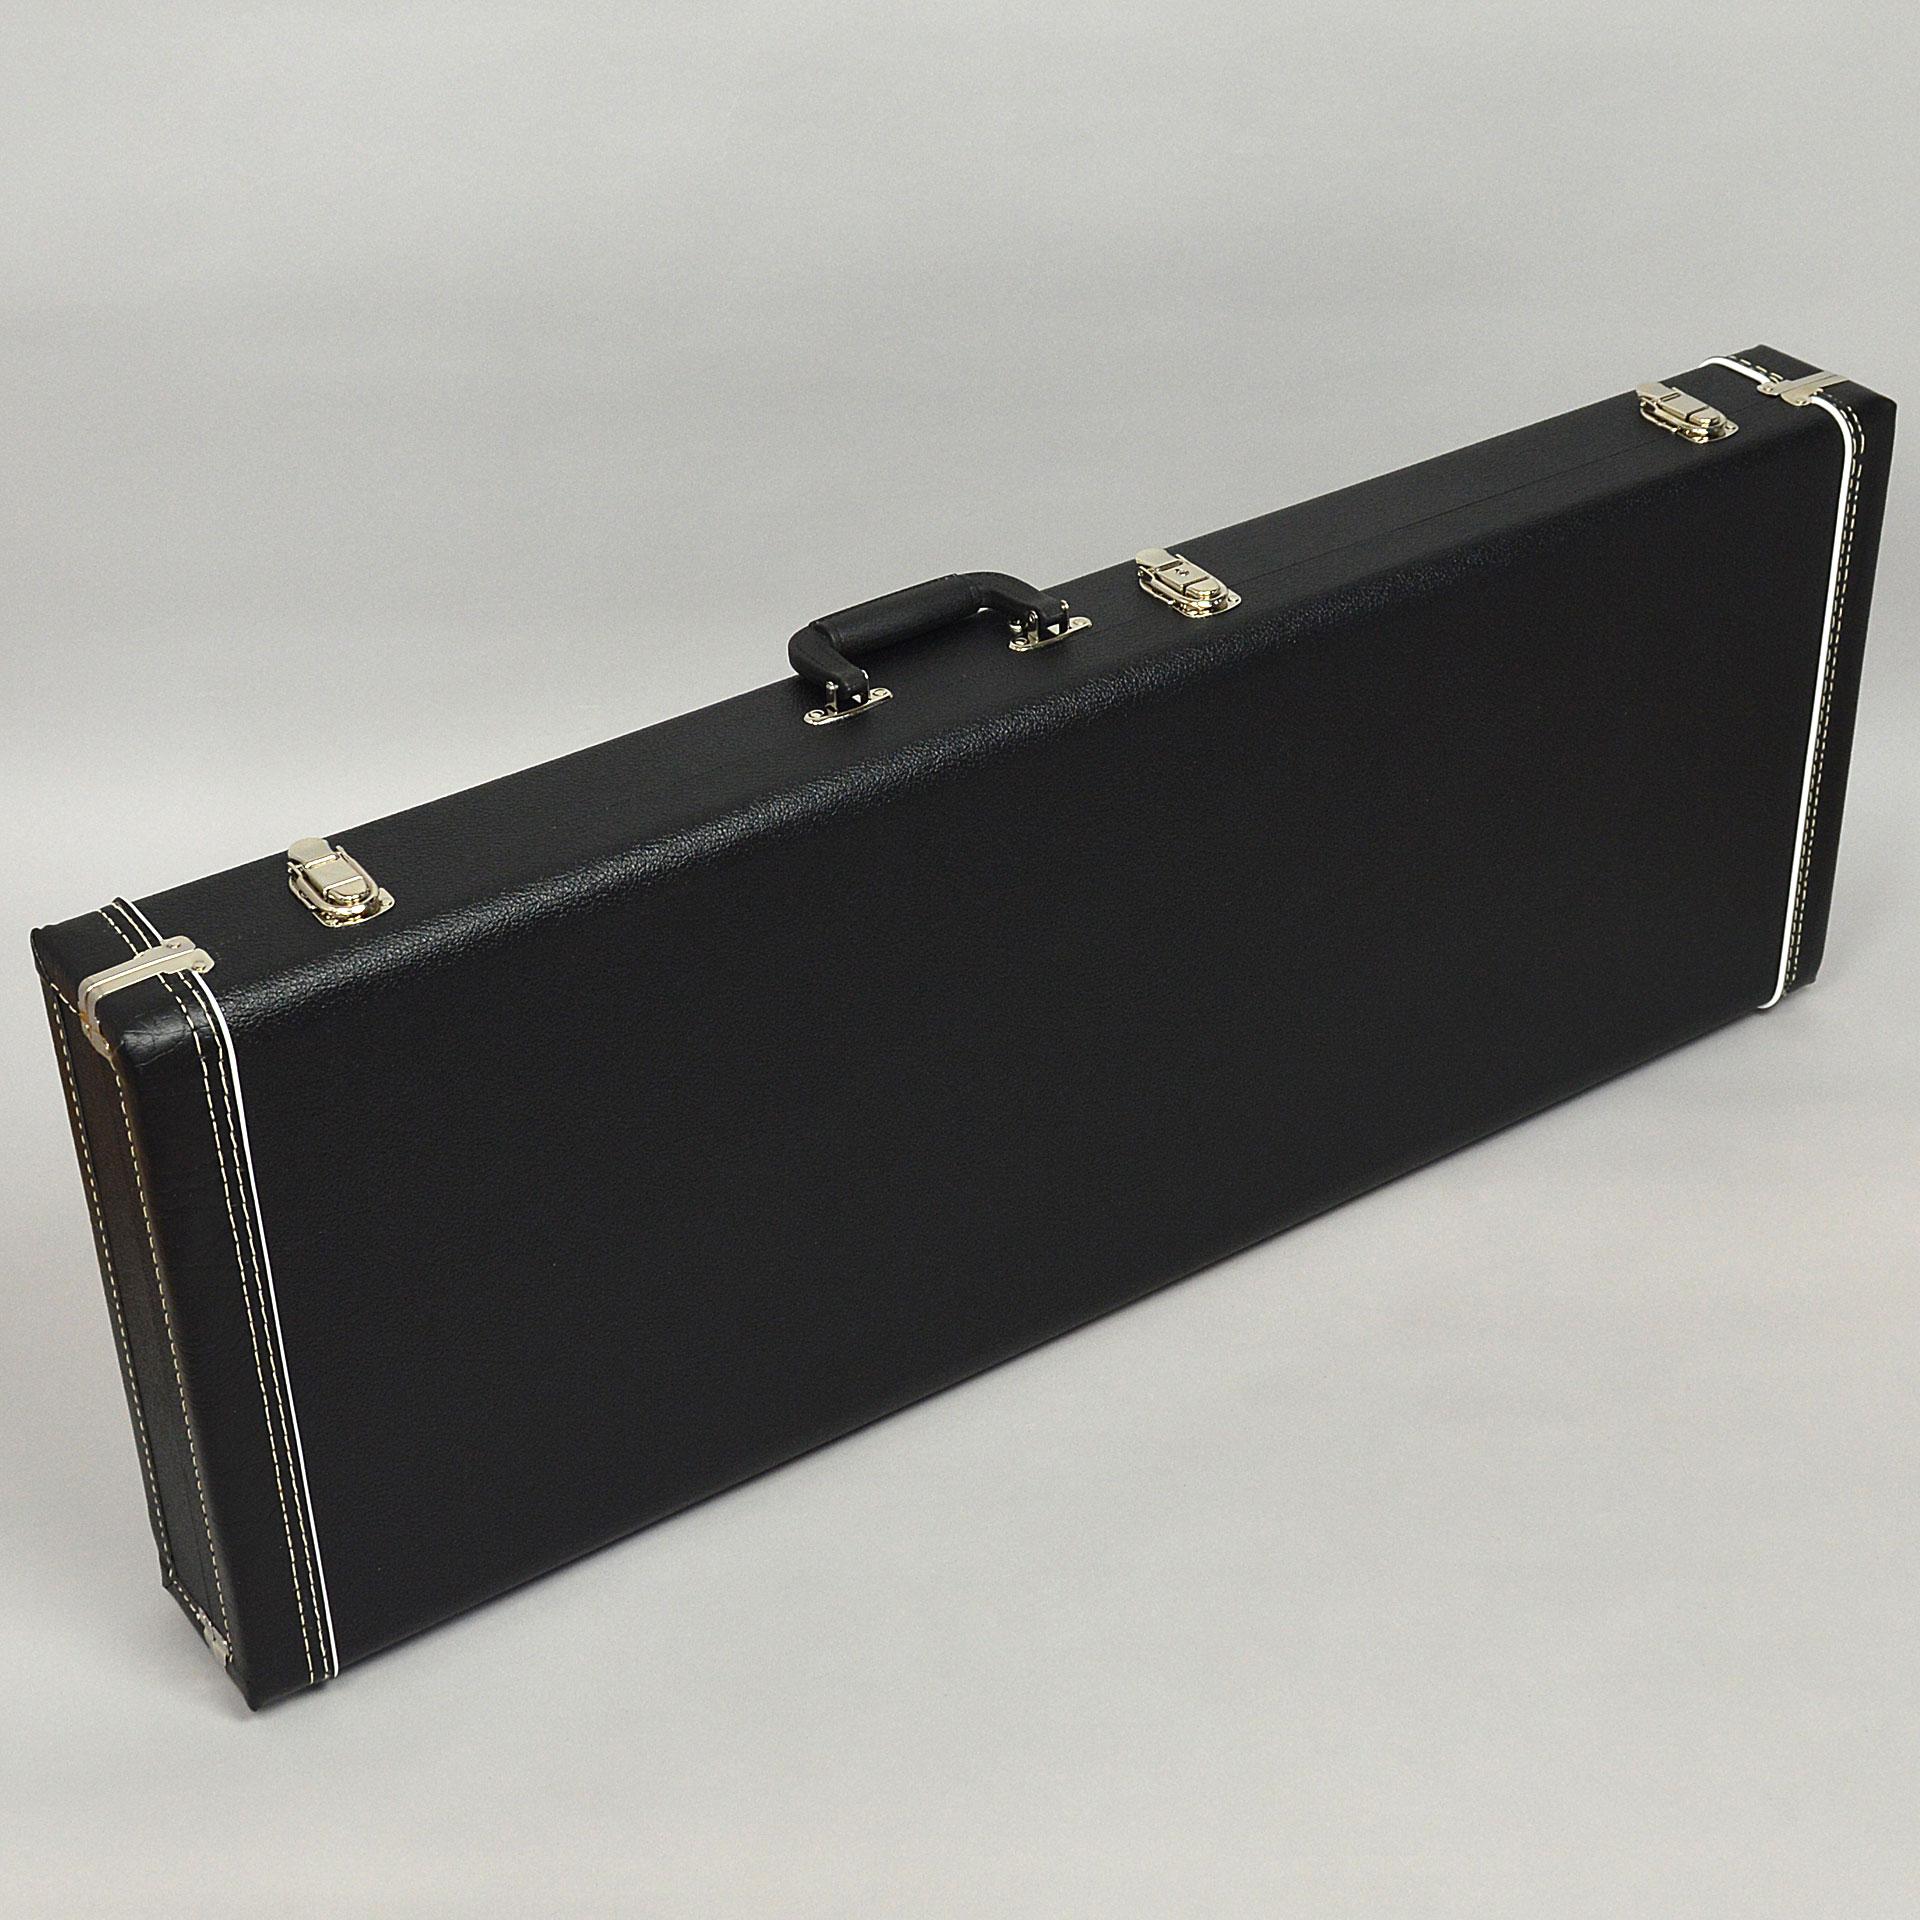 Custom 24 10-Top Flame Maple/Swamp Ash PTのケース・その他画像